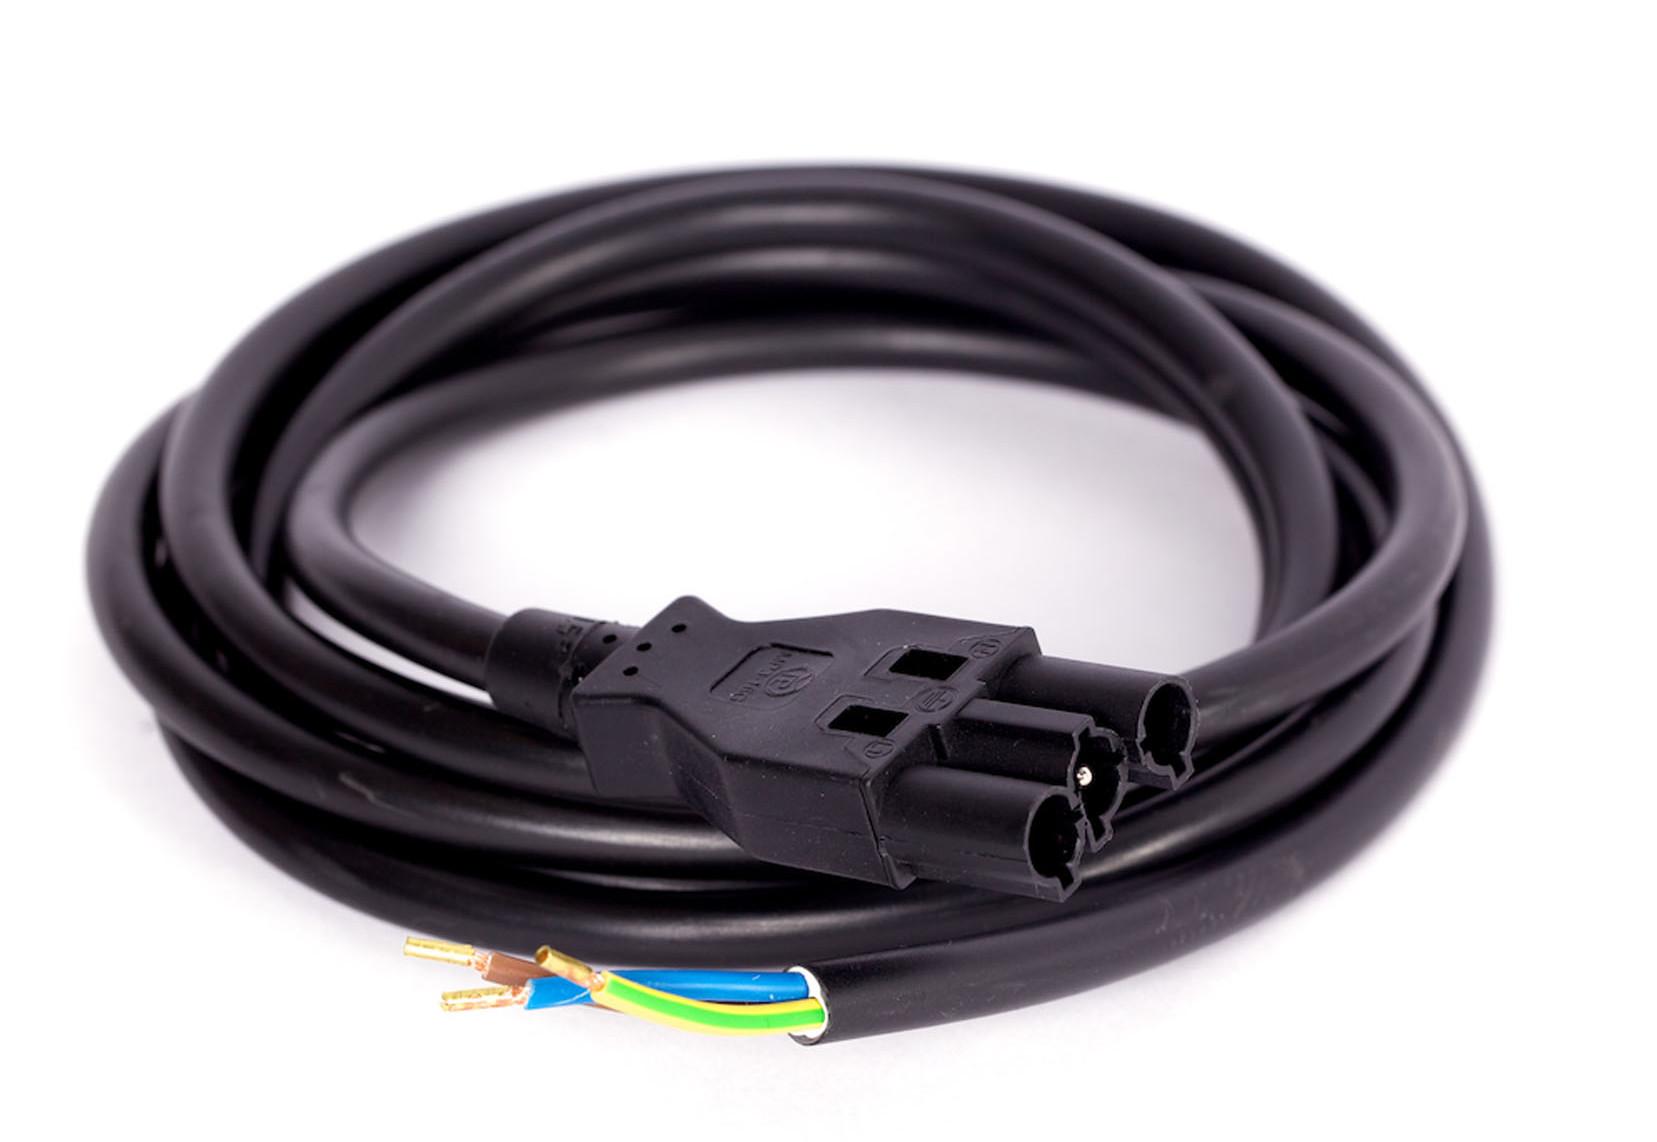 Anschlussleitungen 3-polig